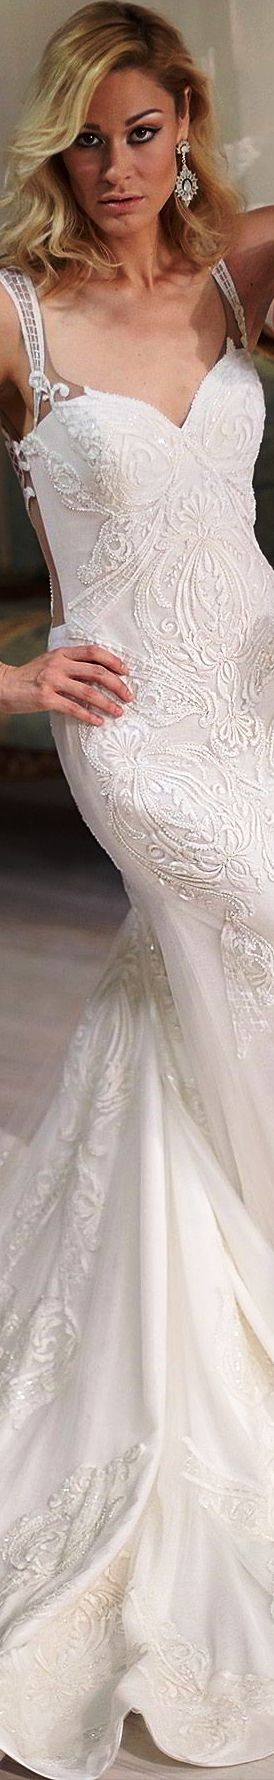 Sarah Jassir Bridal 2018 sleeveless illusion straps sweetheart heavily embellished wedding dress maya chapel train elegant